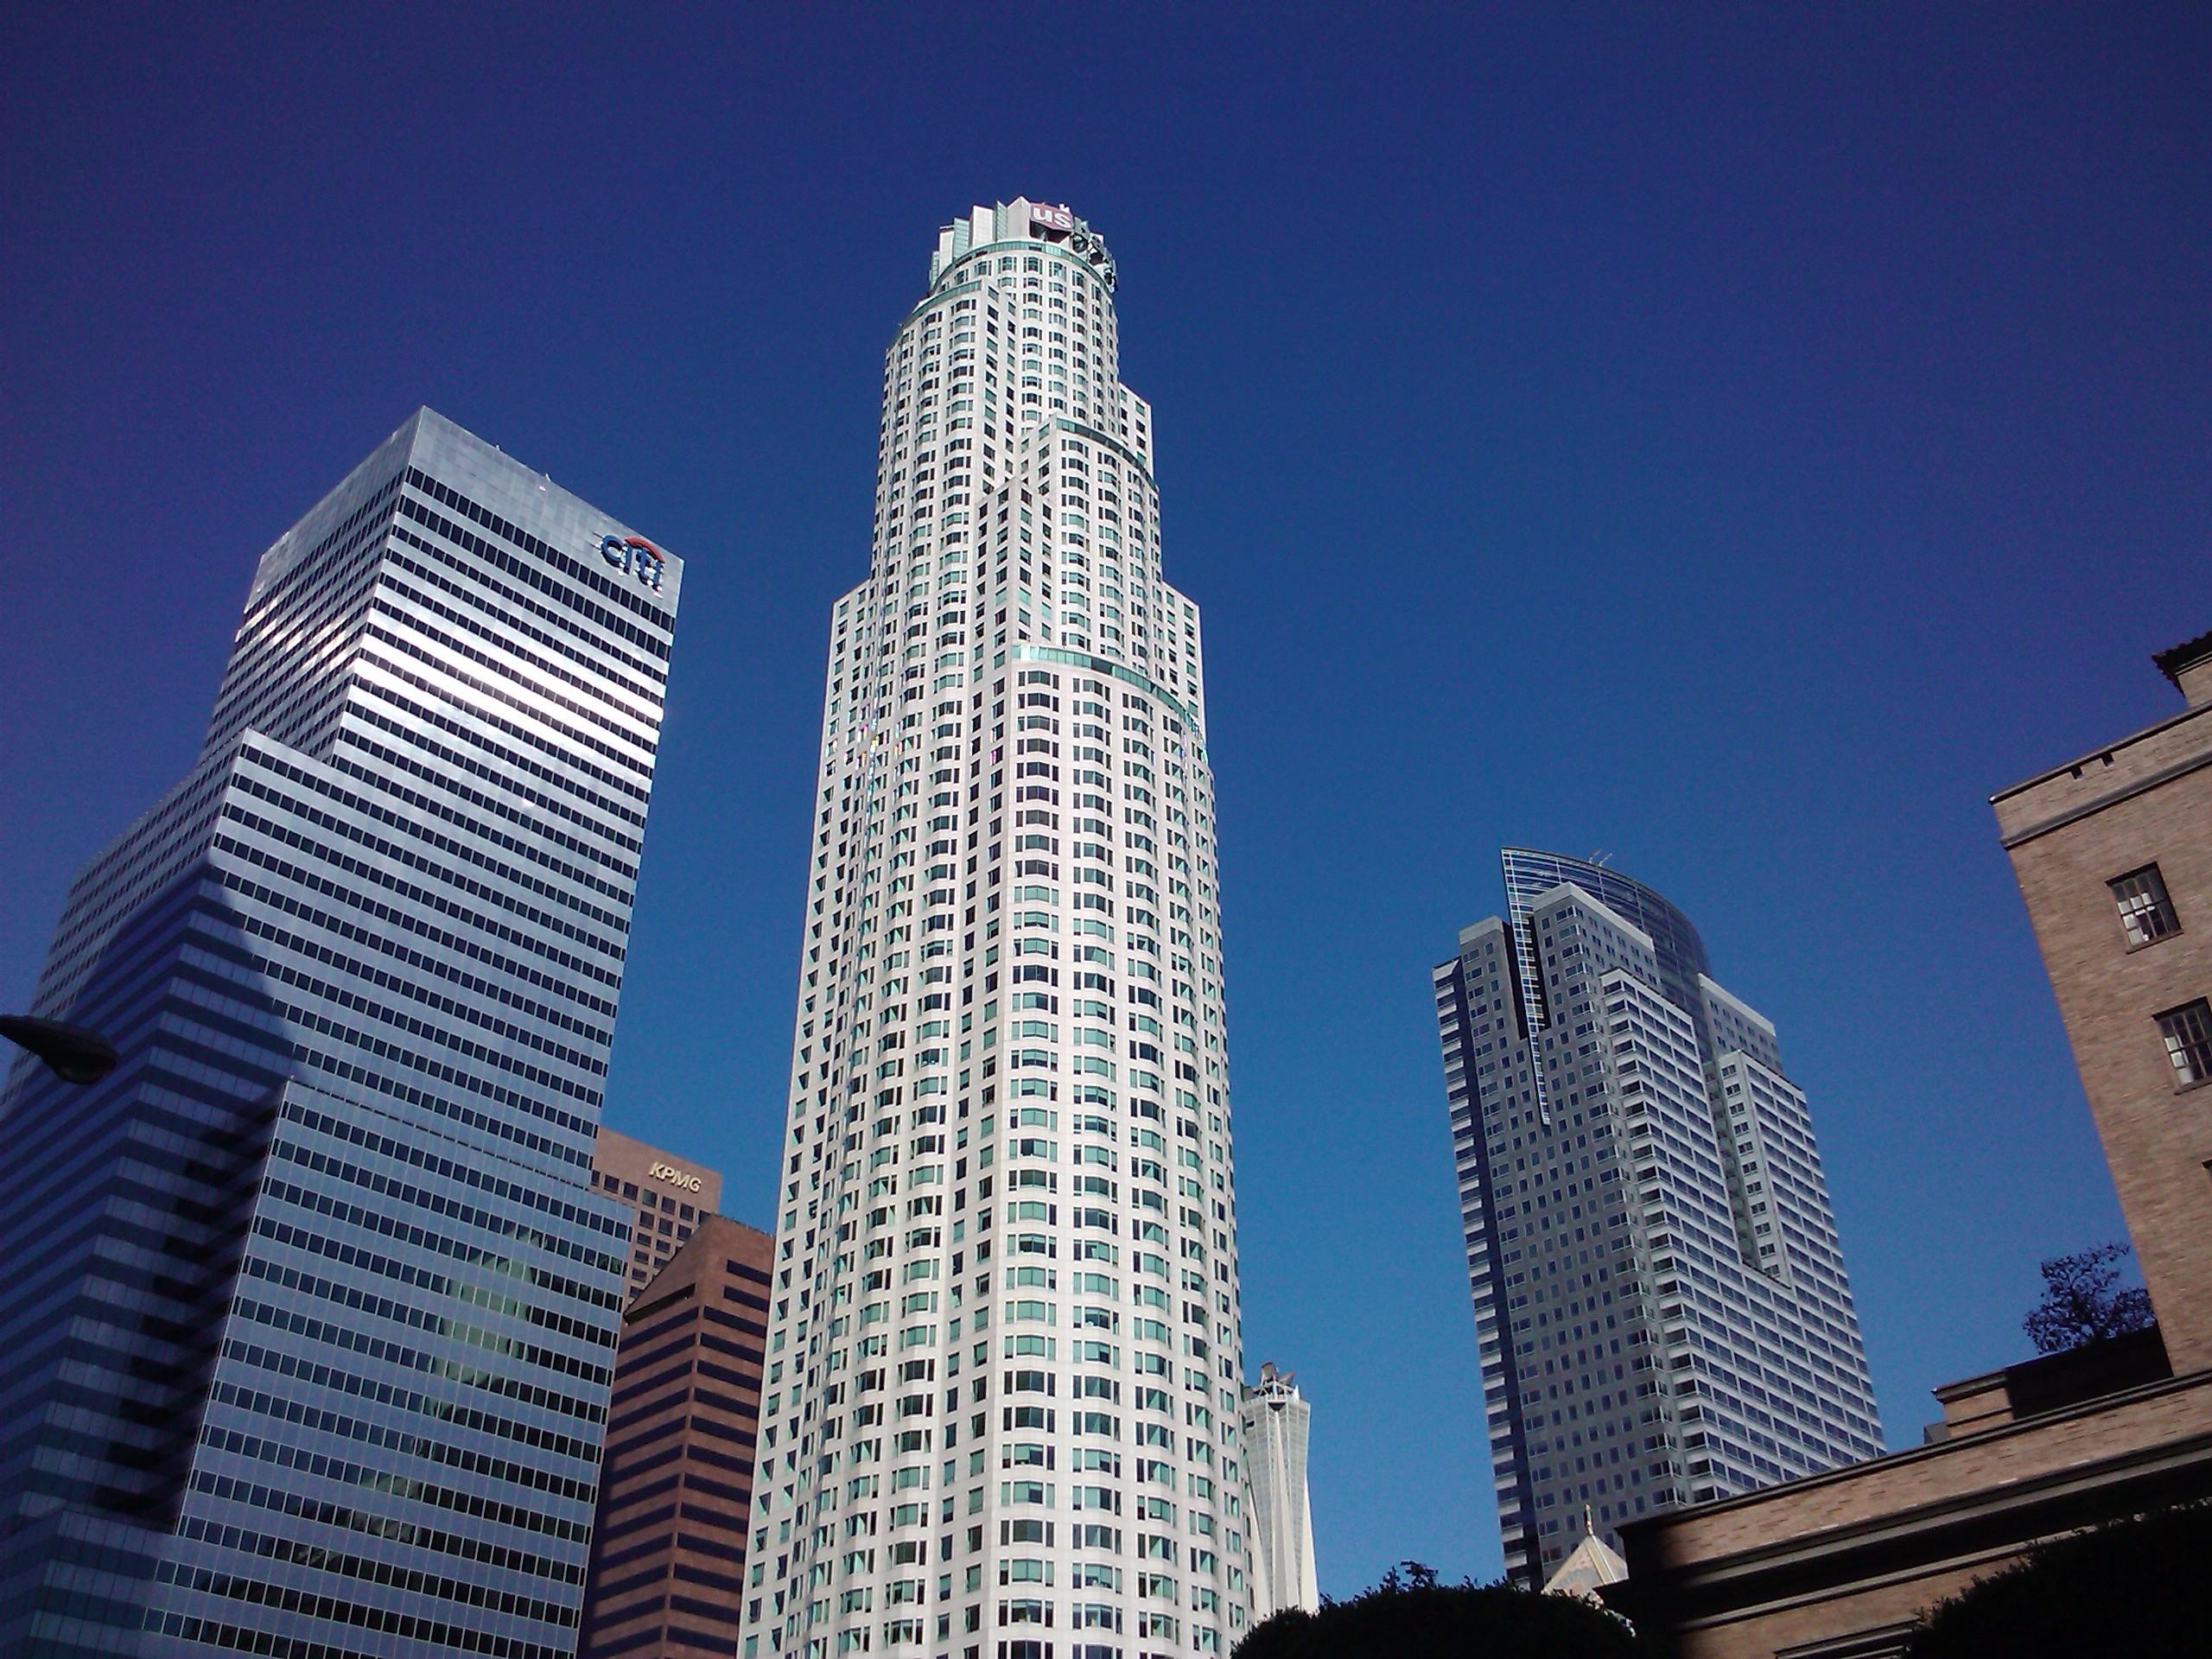 Bank of America Tower ในสหรัฐอเมริกา